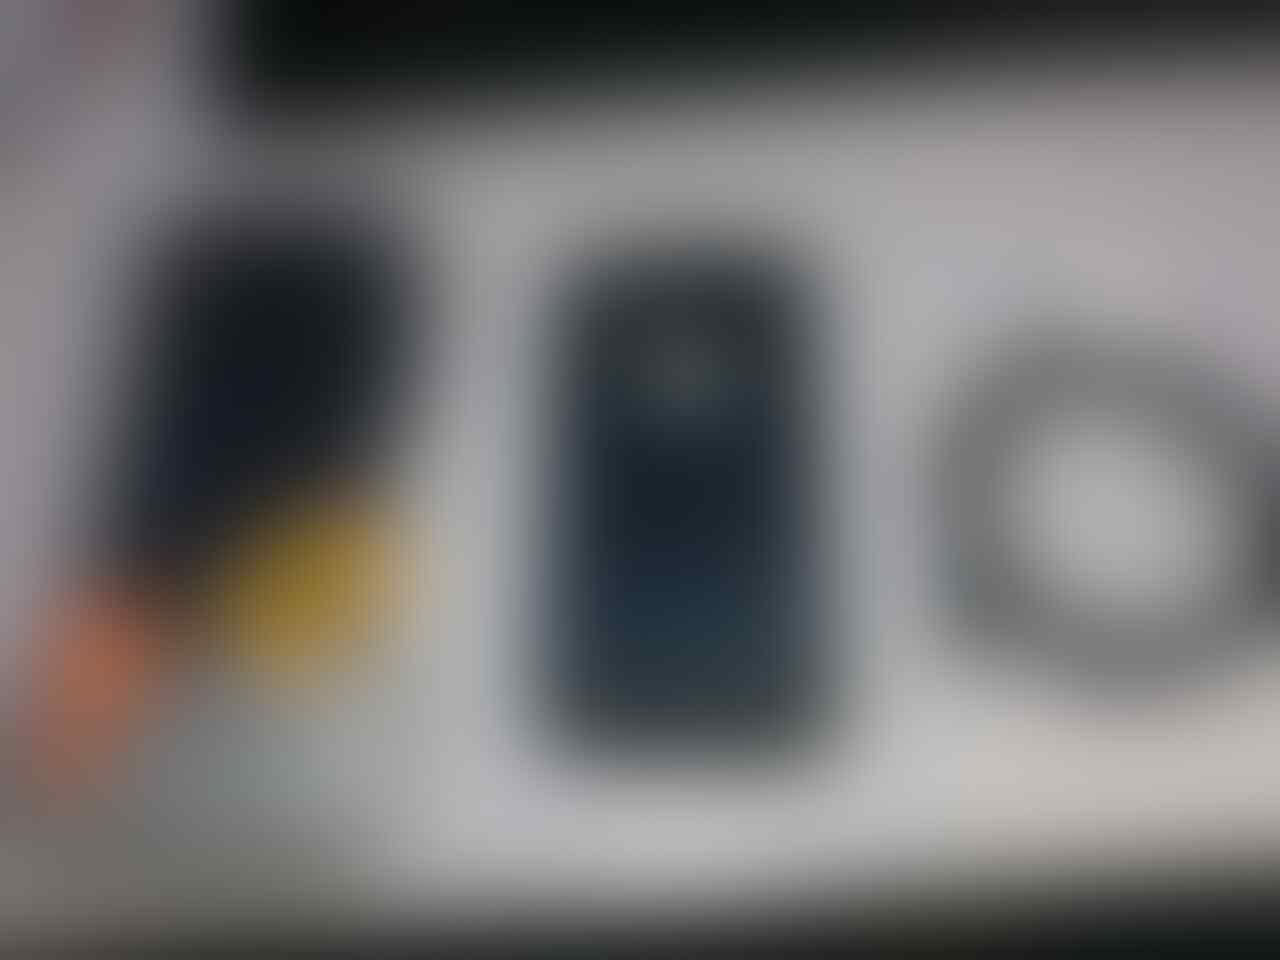 WTS Iphone 5 16GB banyak bonusnya